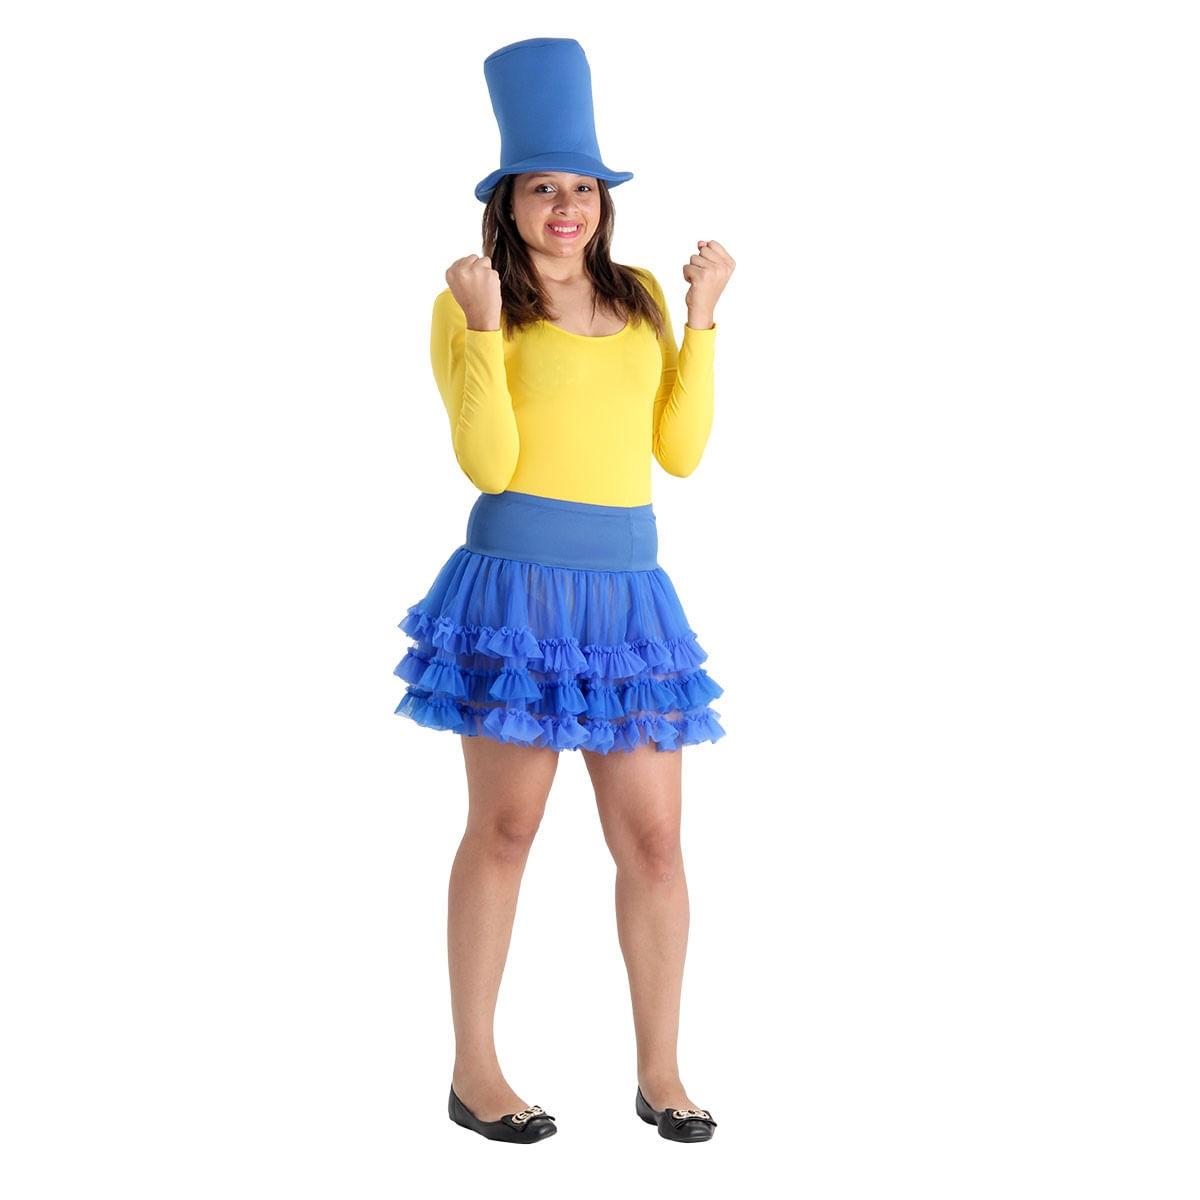 Fantasia Make your Own - Saia Tutu Azul Adulto